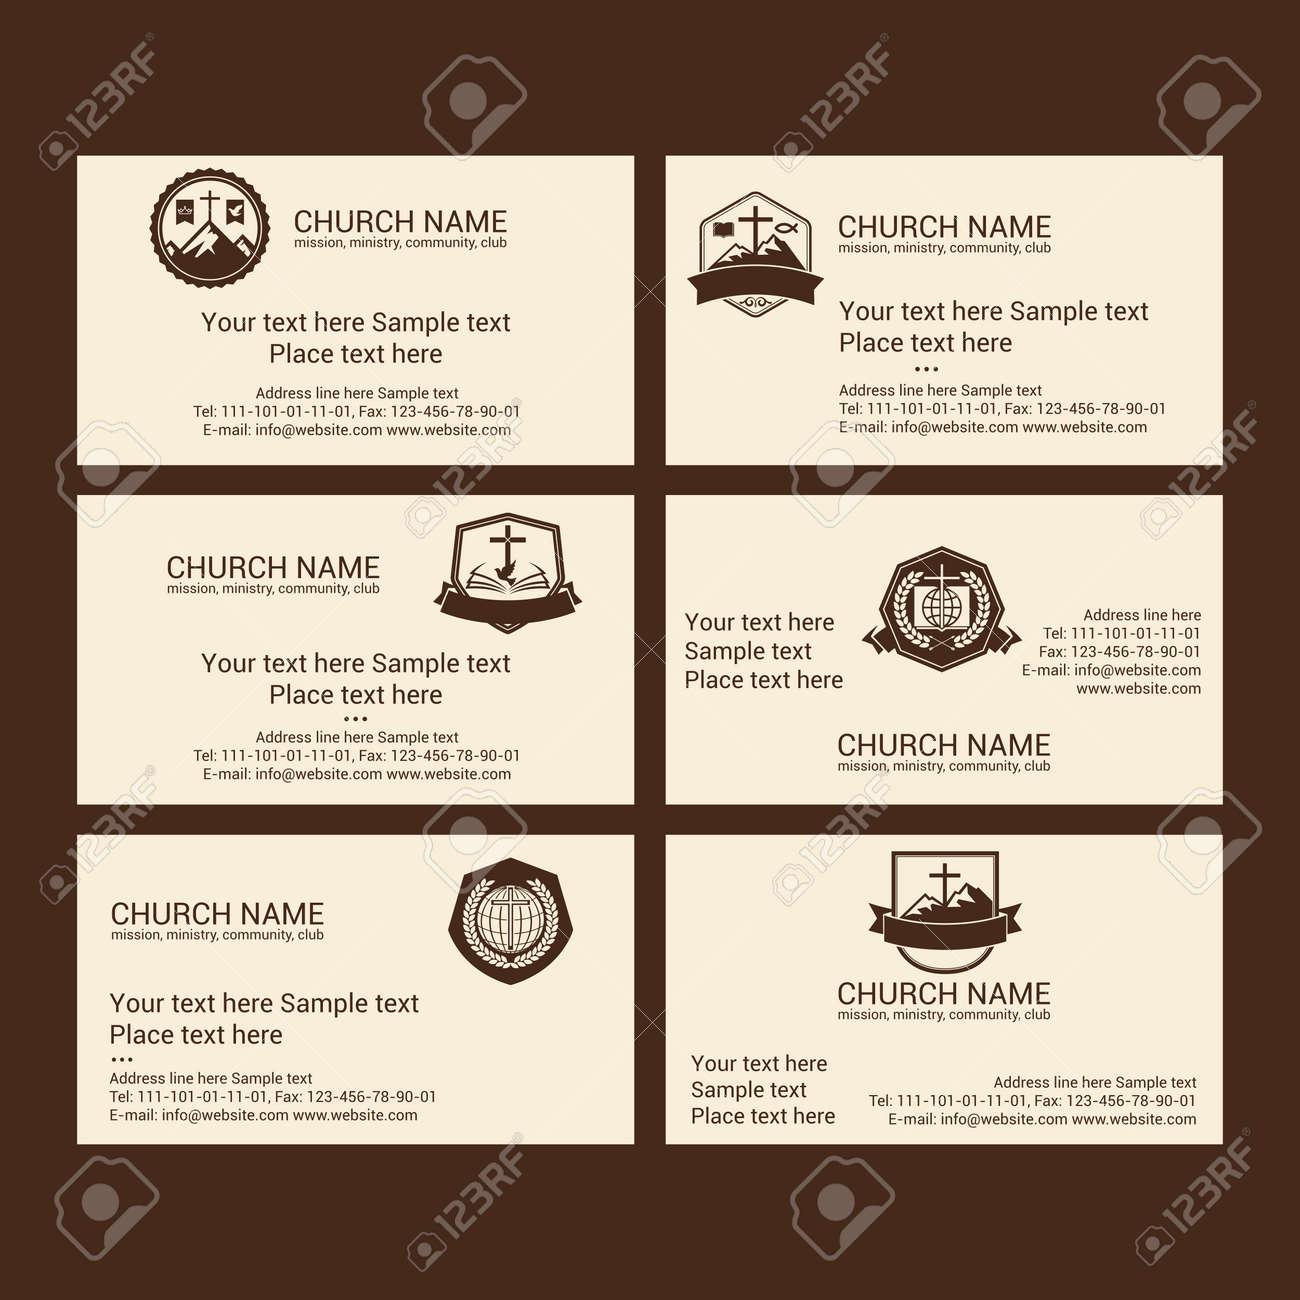 Comfortable Business Cards 123 Ideas - Business Card Ideas - etadam.info